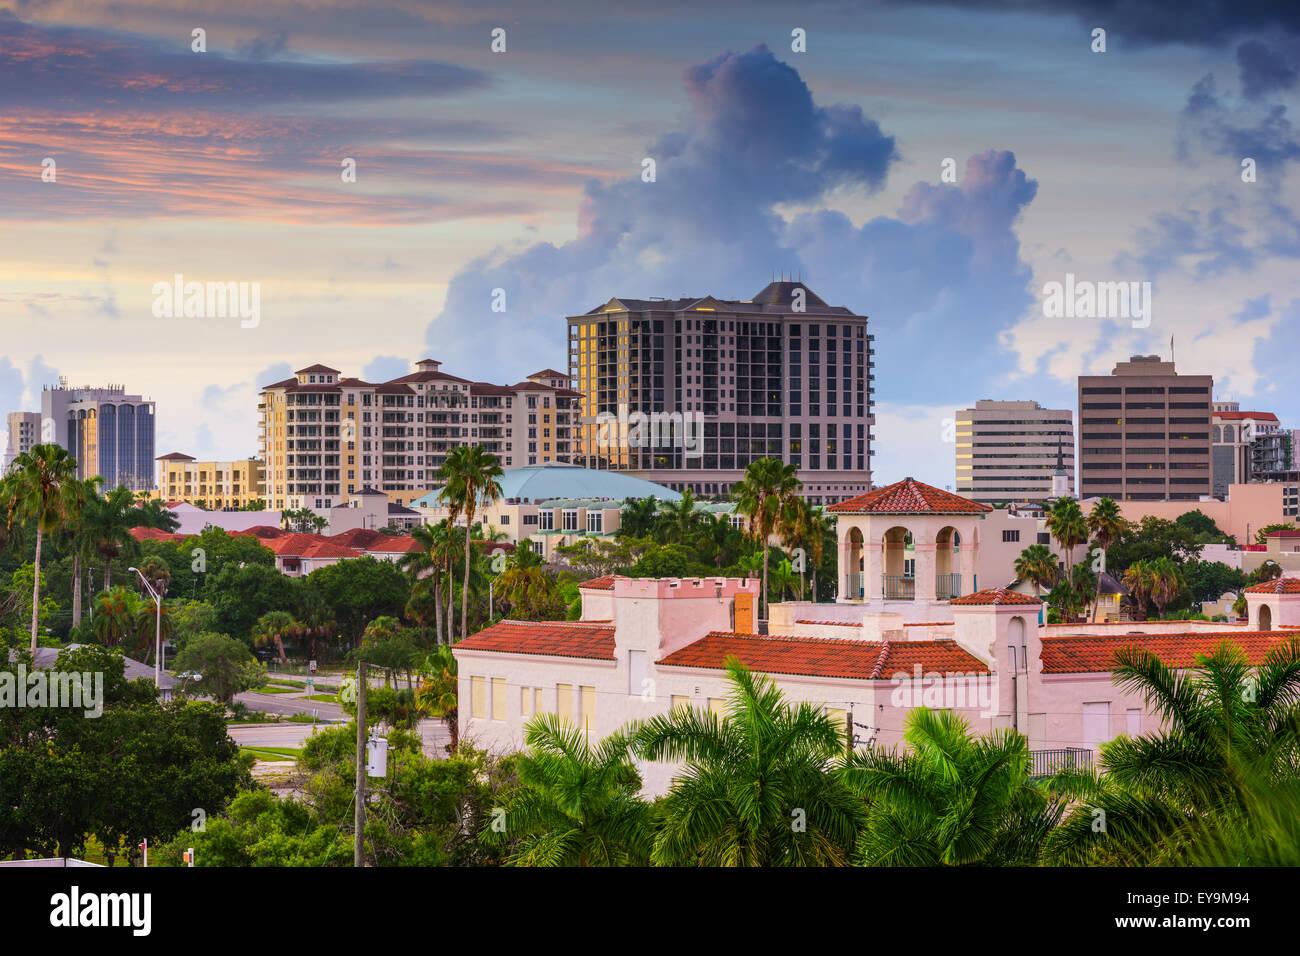 Sarasota, Florida, EE.UU. Perfil del centro de la ciudad. Foto de stock